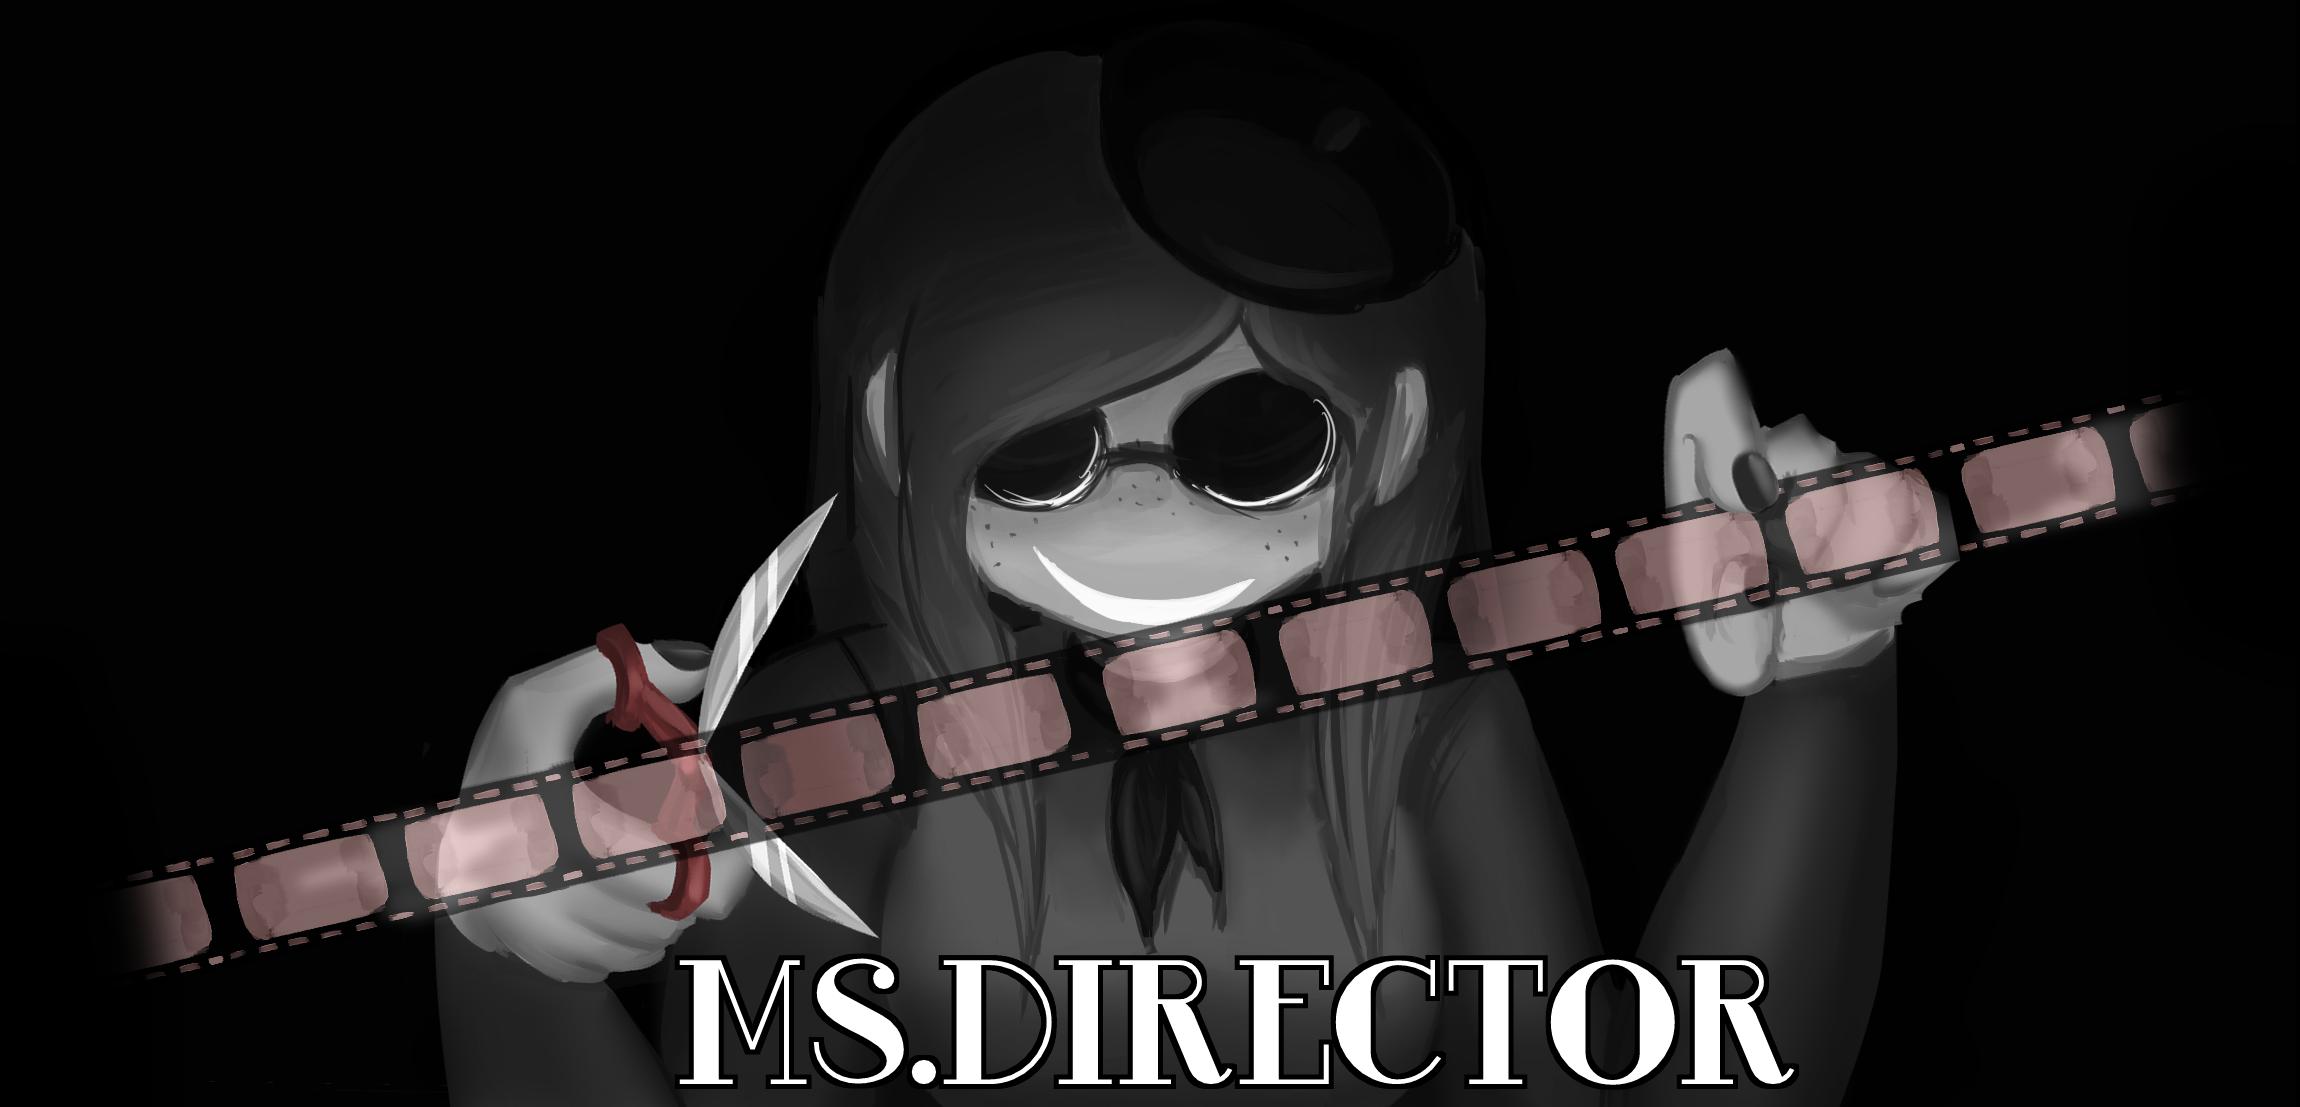 Ms.Director